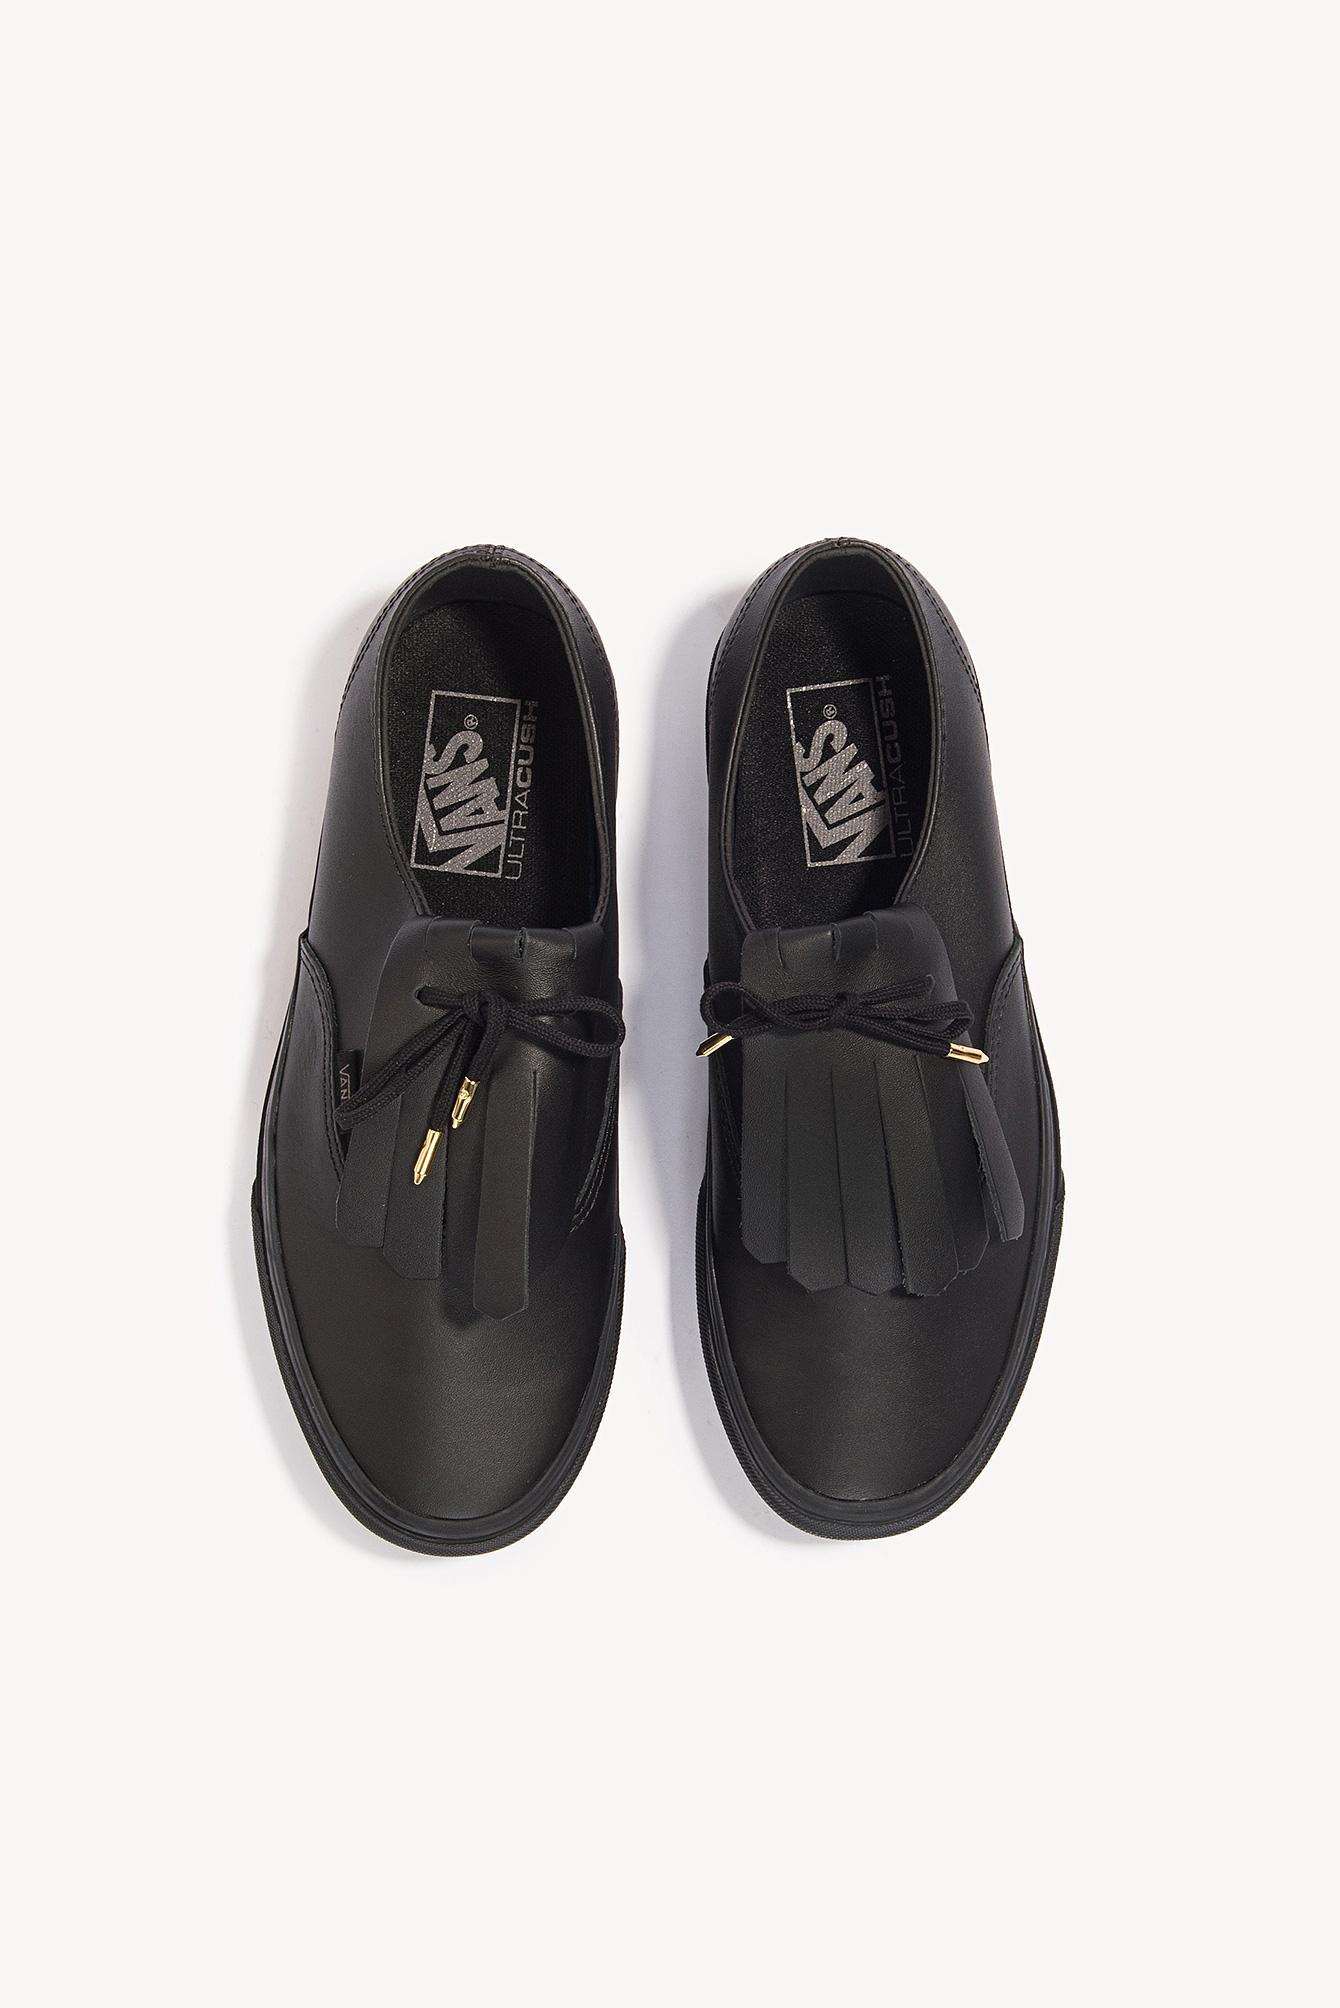 3279b07873 Lyst - Vans Authentic Fringe Dx Black gold in Black